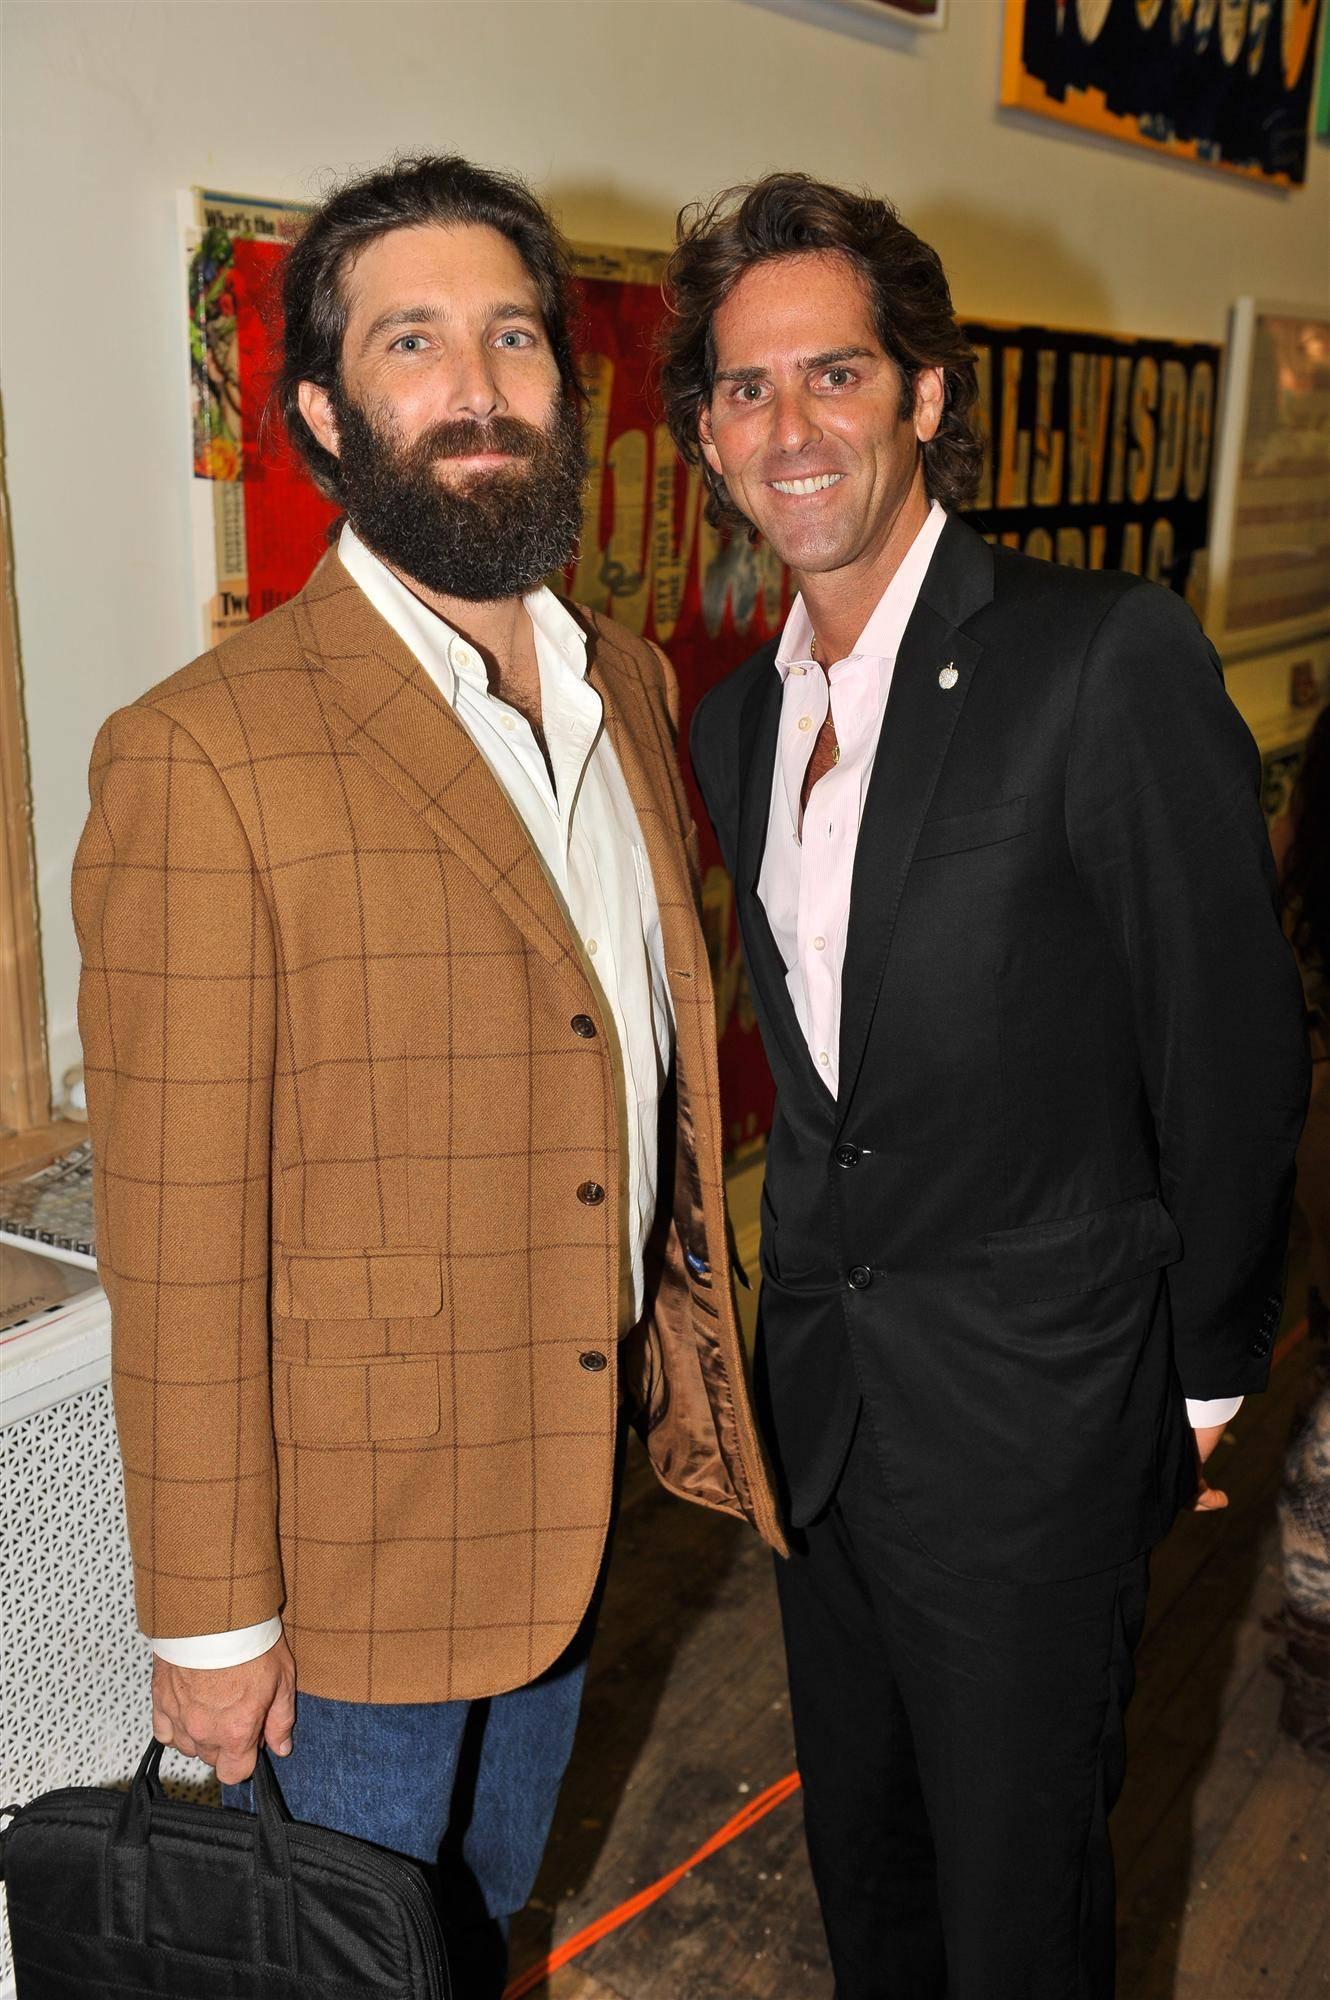 Andrew Levinson MD & Jeffrey Beri (Custom)